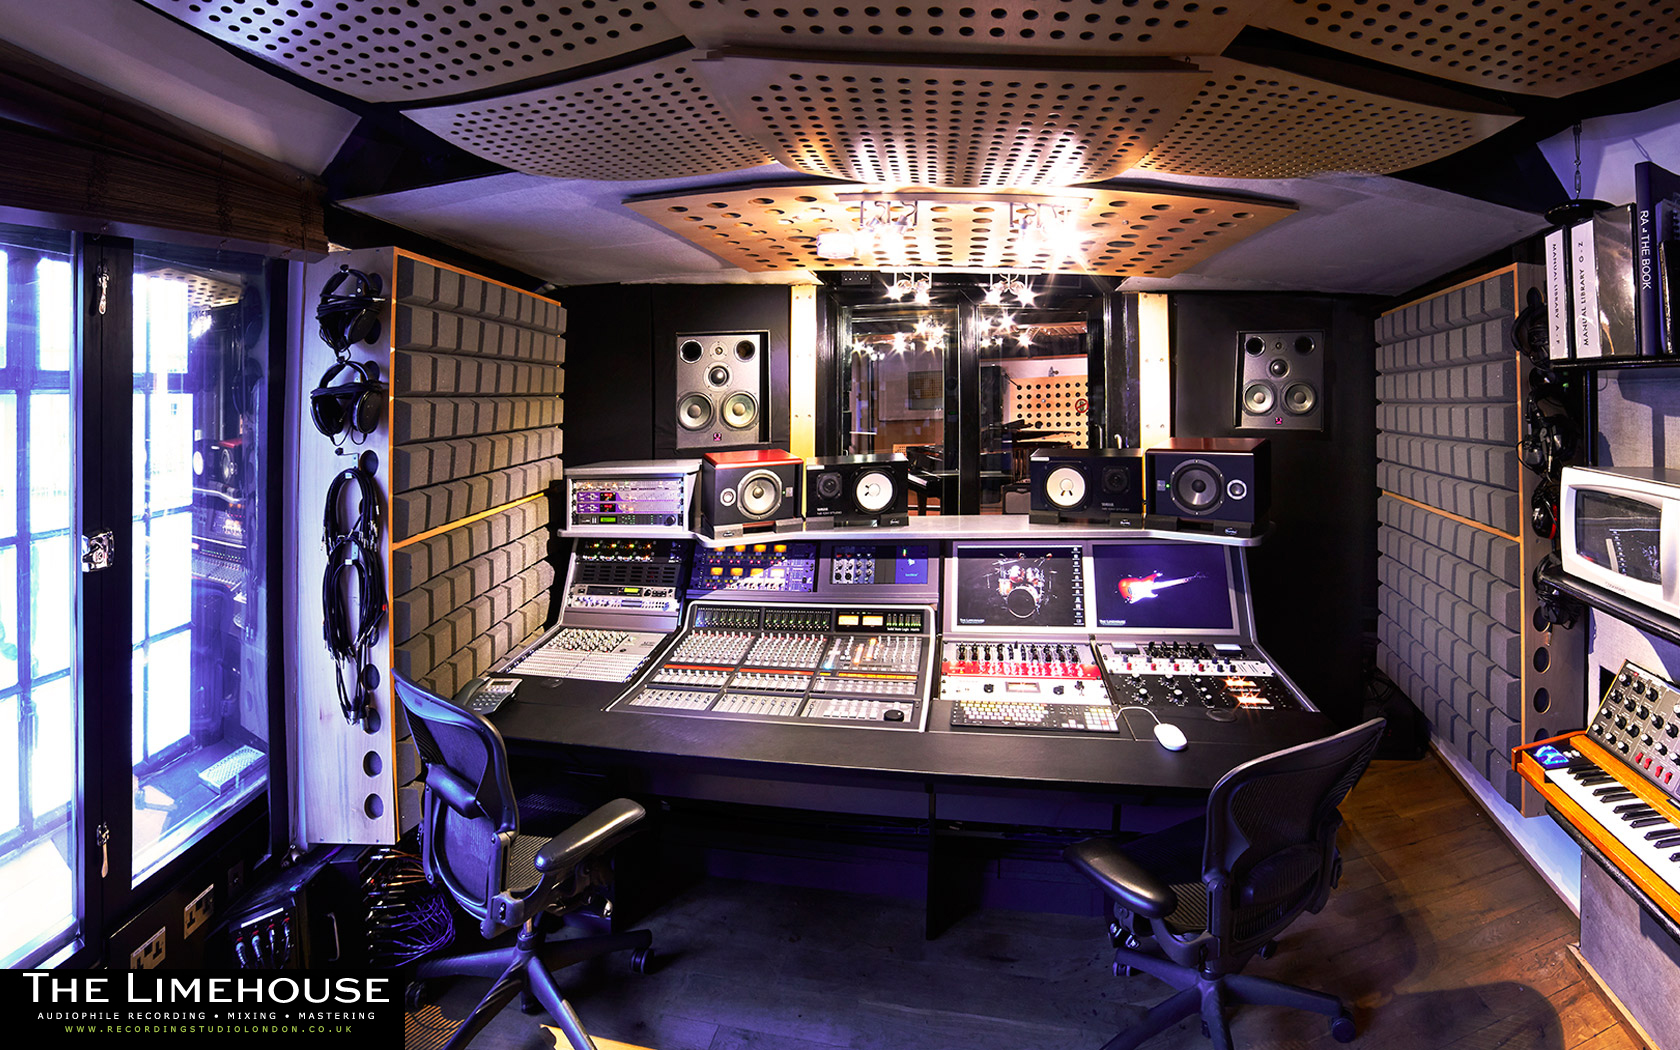 High Resolution Recording Studio Wallpaper images 1680x1050